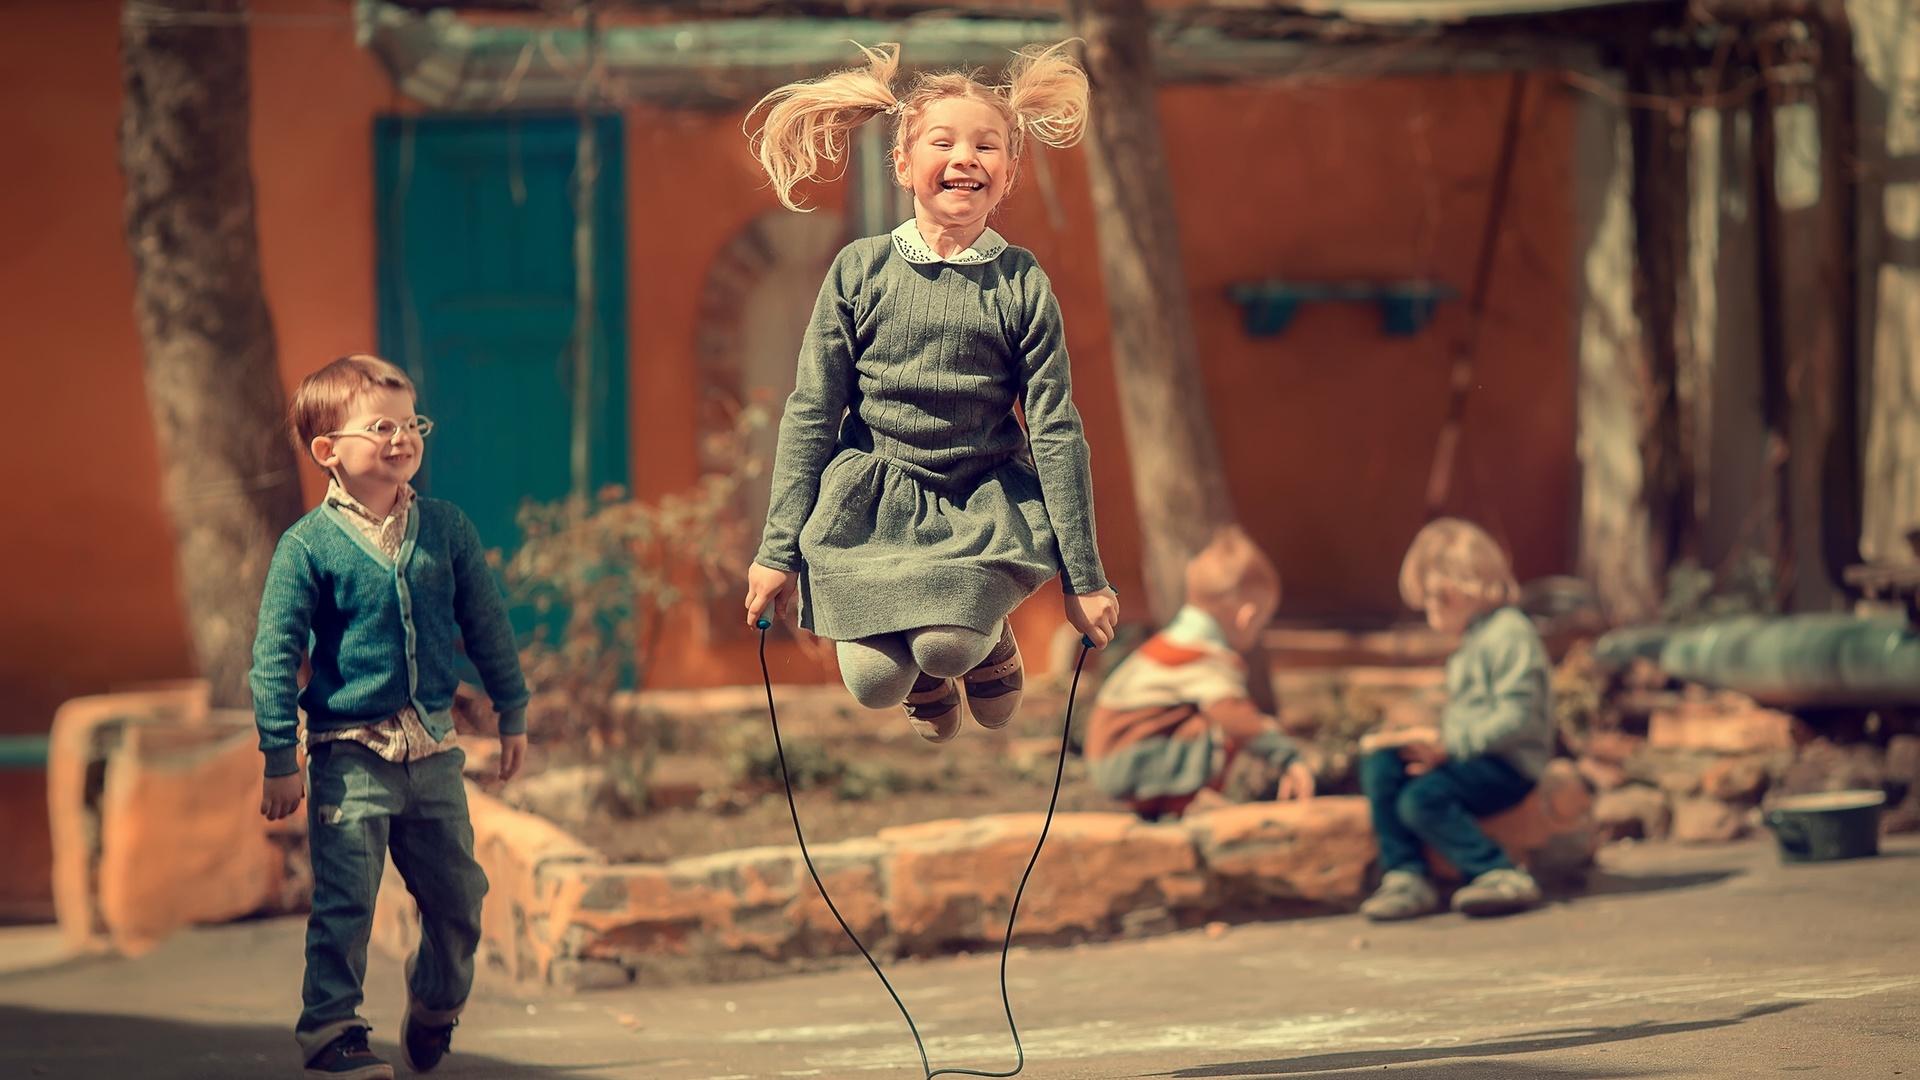 поделиться картинки про дитинство особо запущенных